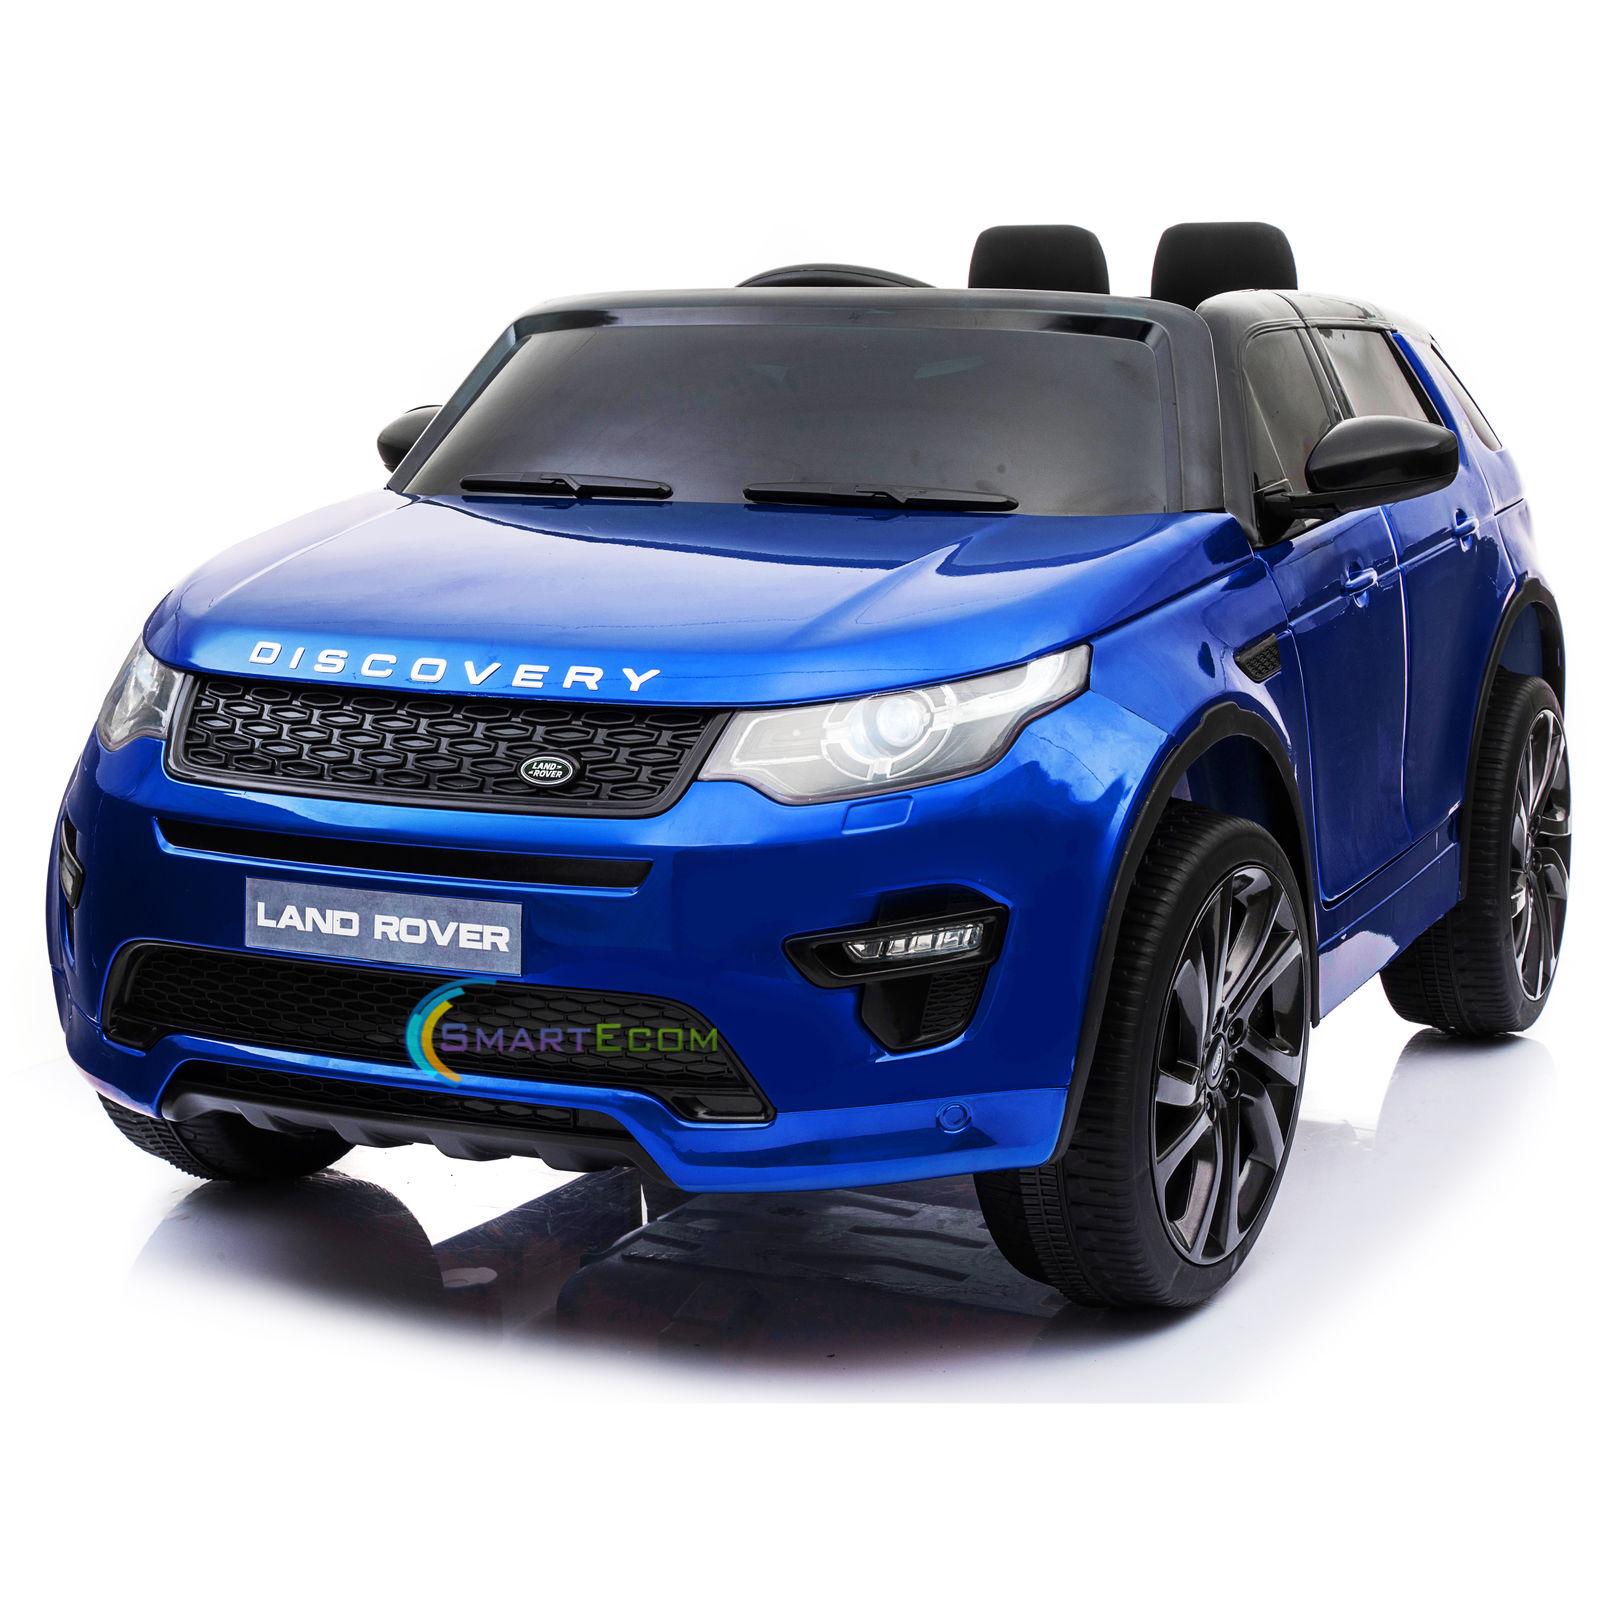 Smartecom 12v Battery Car Toys Land Rover Remote Control Mp4 Touch